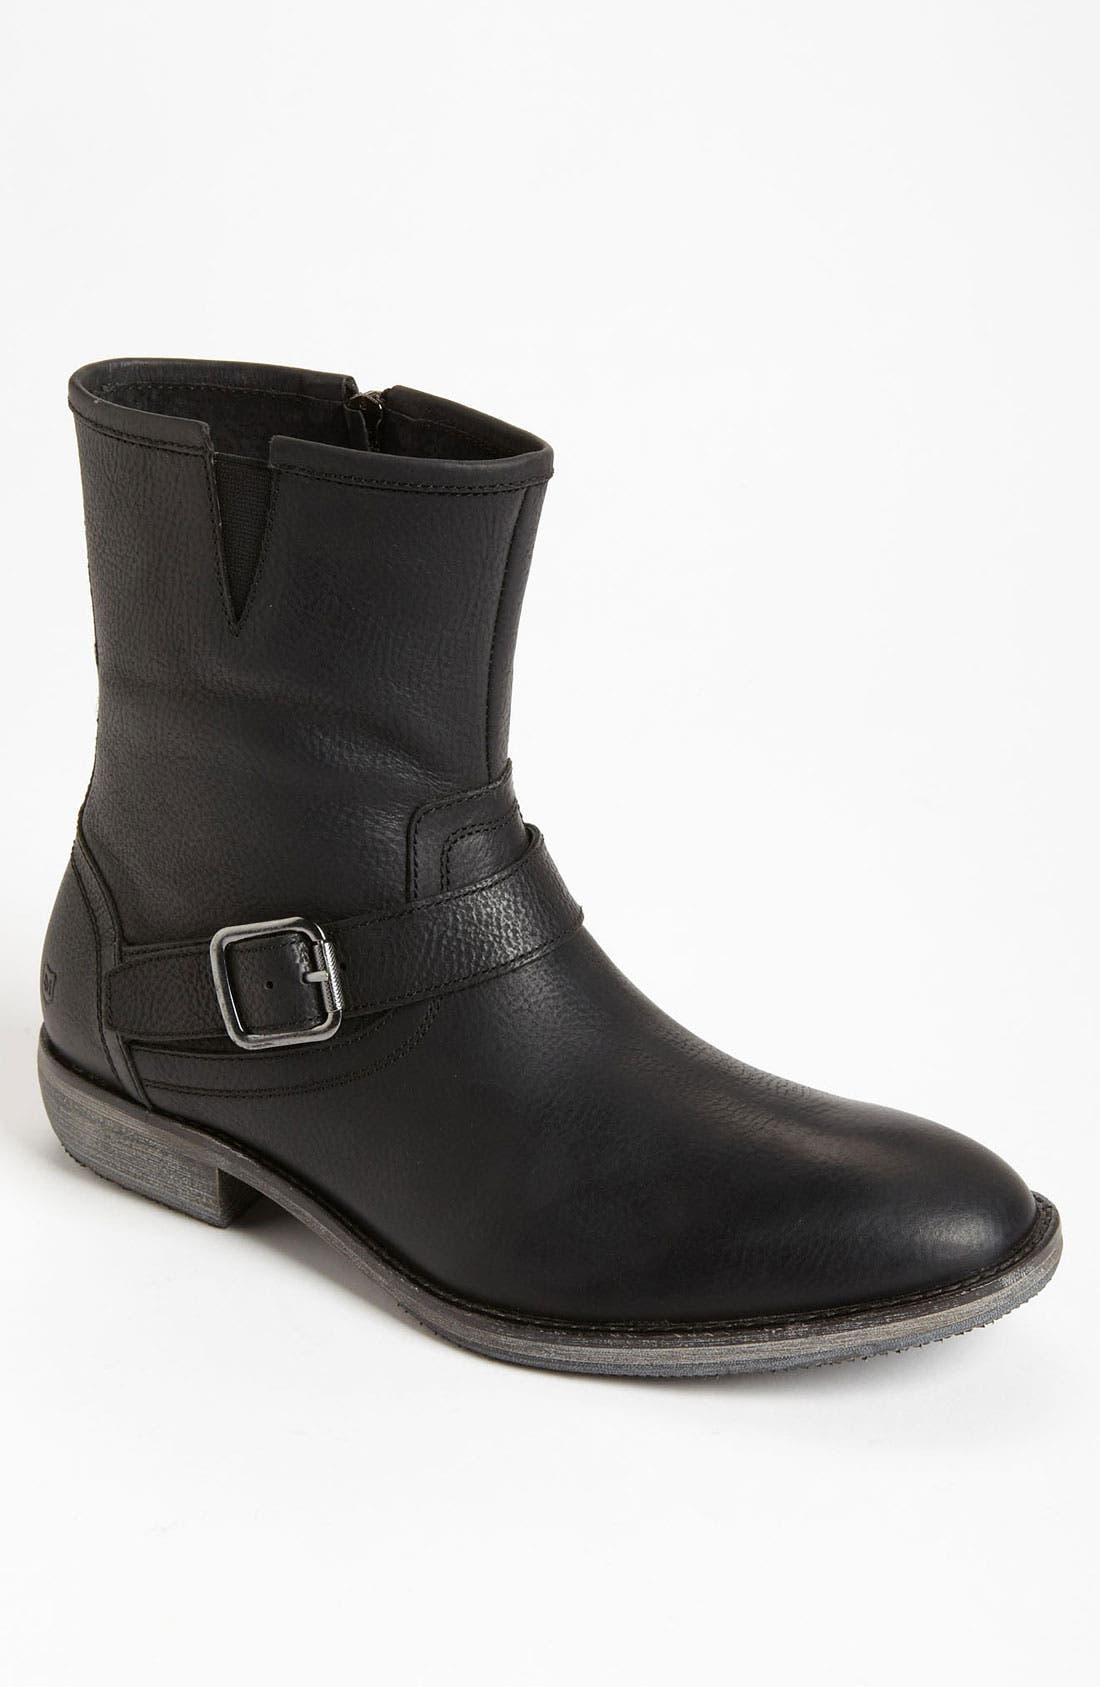 Alternate Image 1 Selected - Andrew Marc 'Roxbury' Boot (Men)